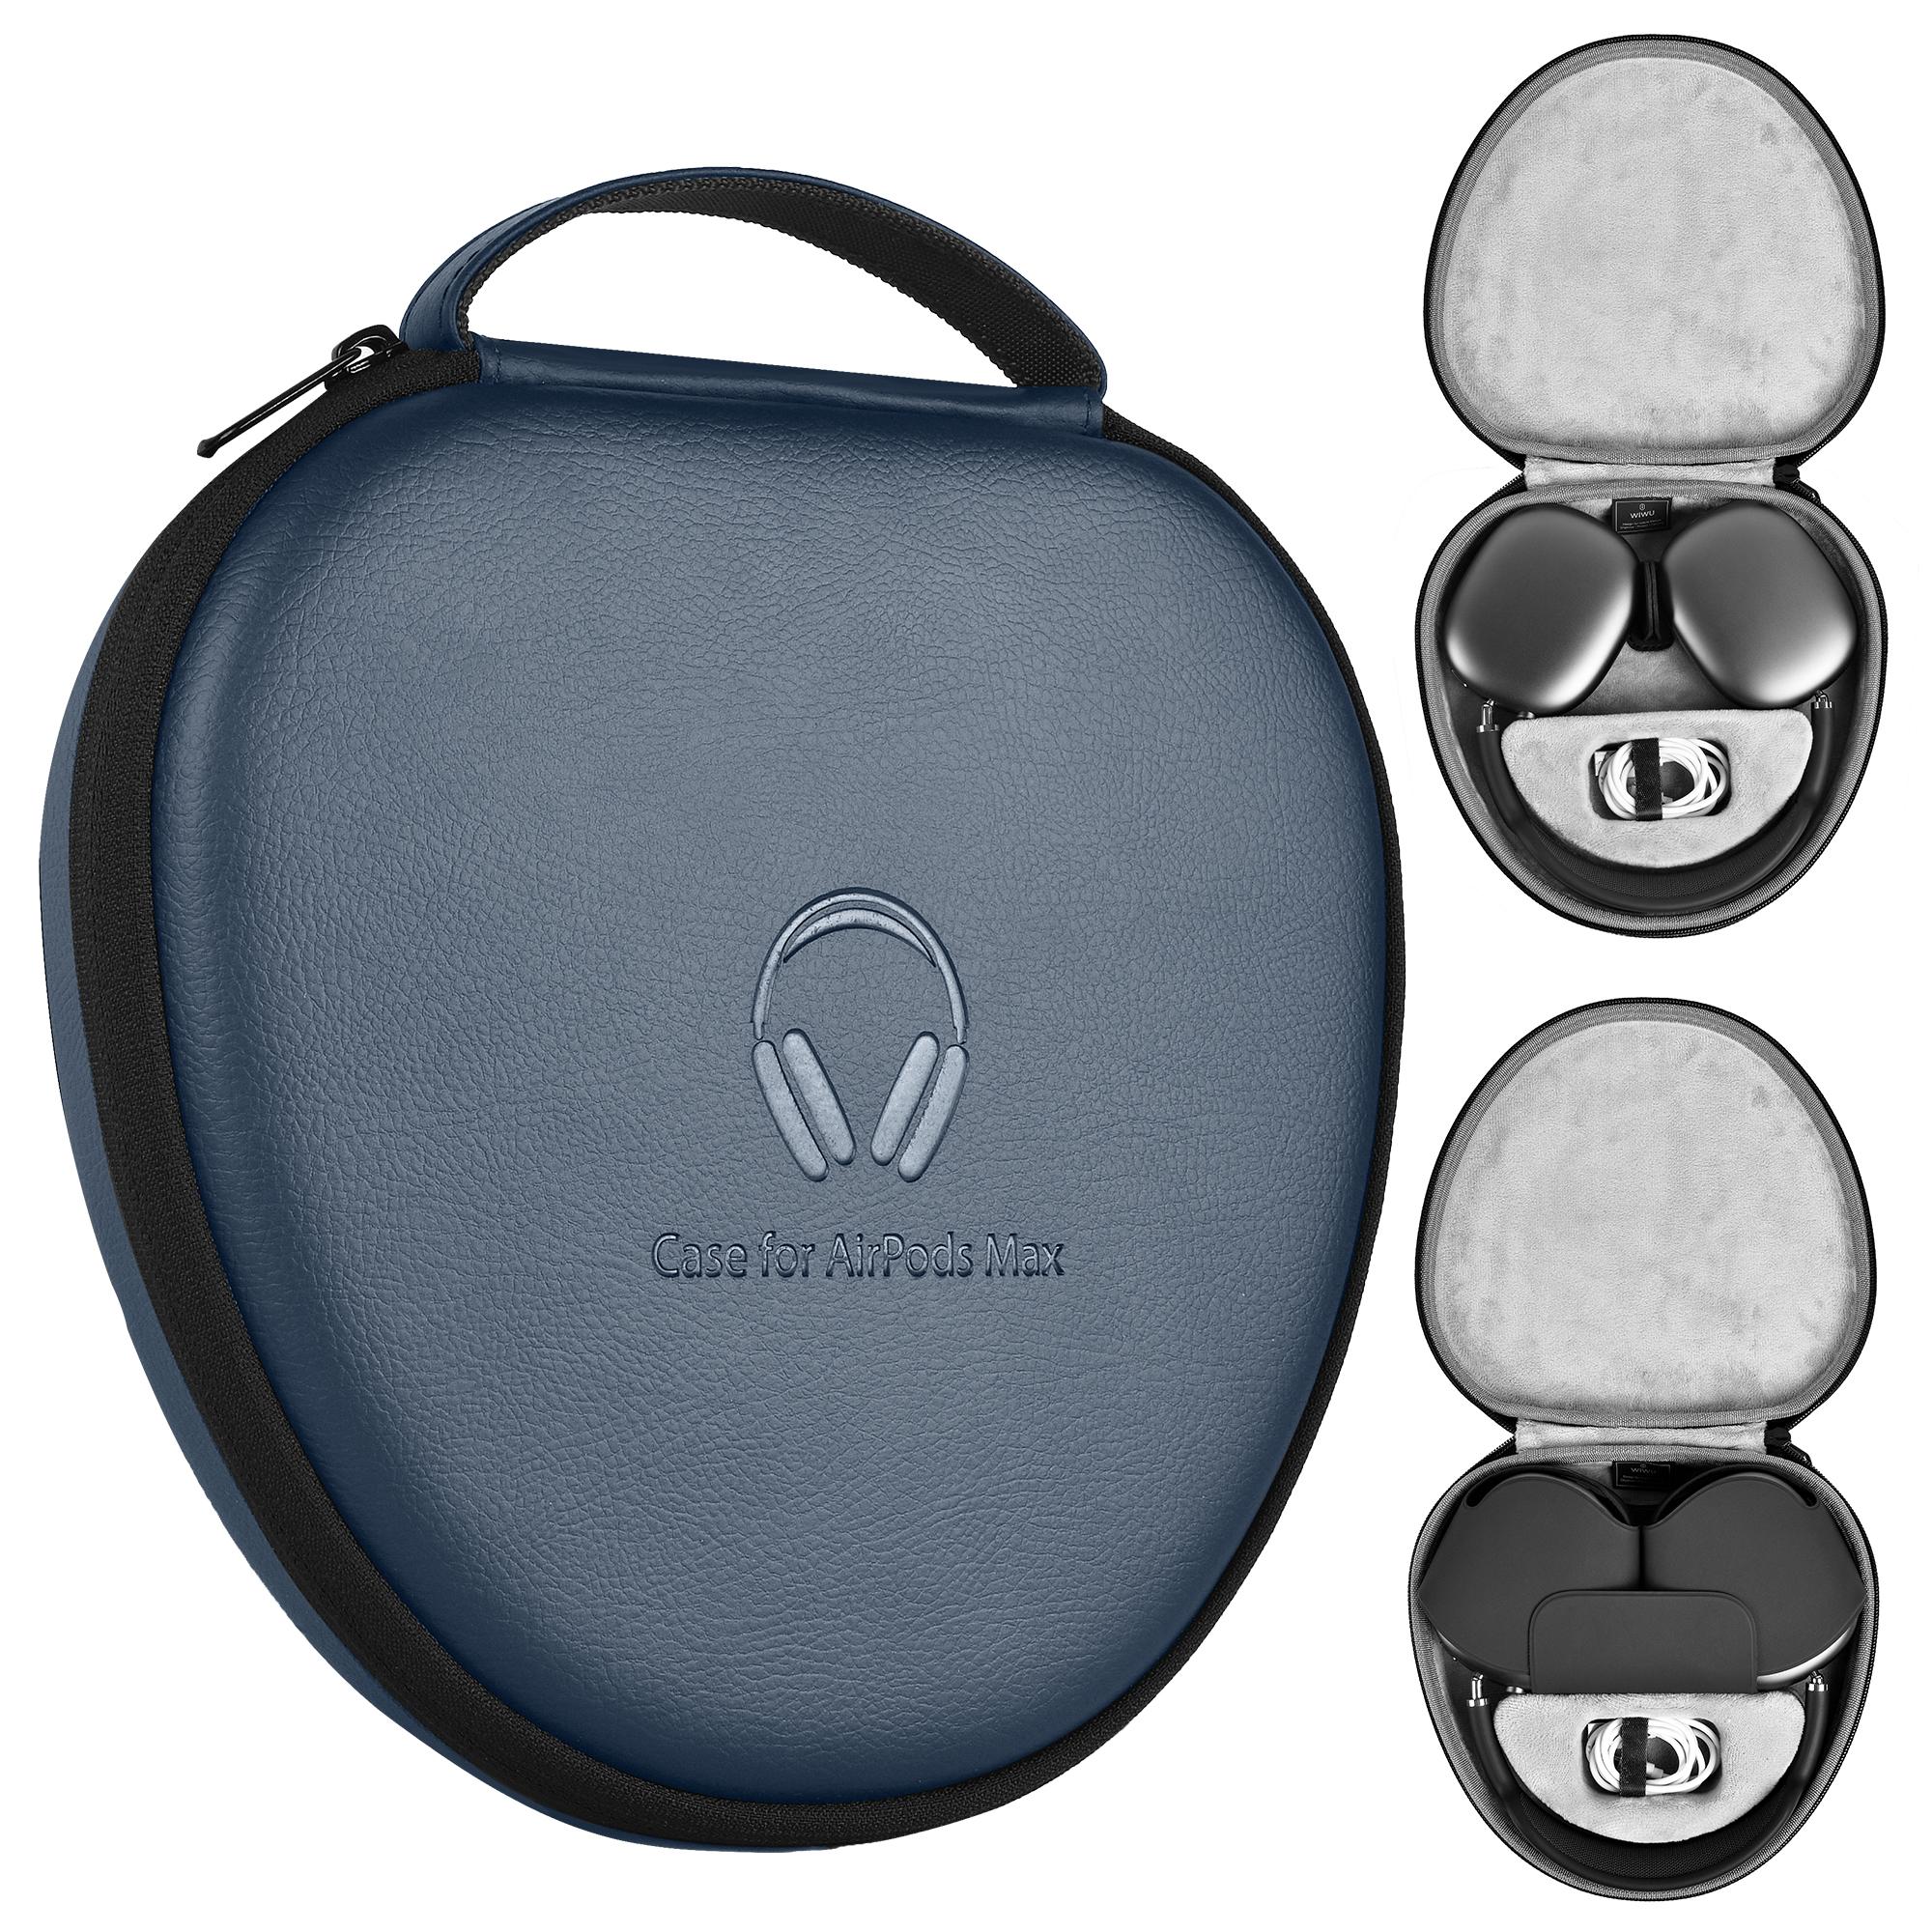 WiWU 适用于Airpod Max智能耳机套 (https://www.wiwu.net.cn/) AirPods 保护壳 第3张